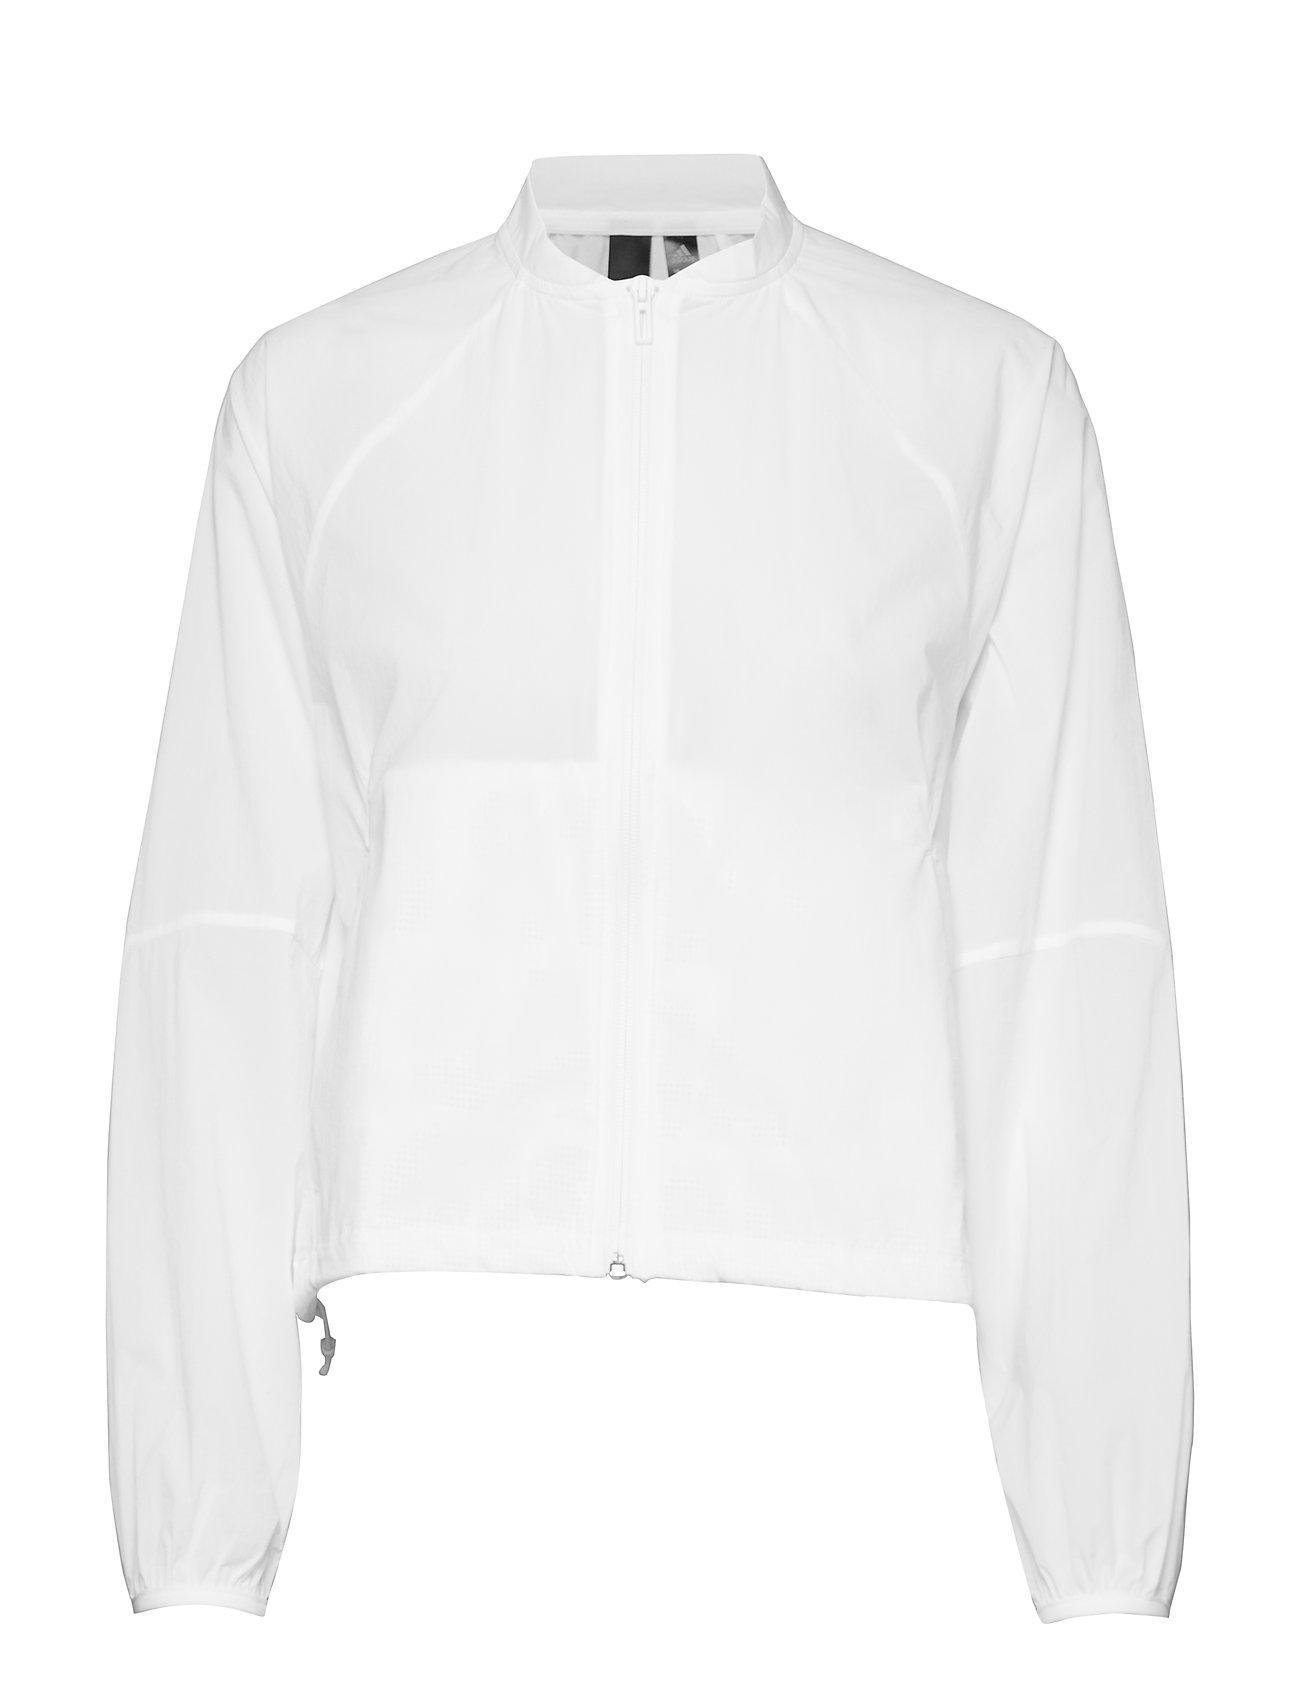 adidas Performance W Pck Blouson - WHITE